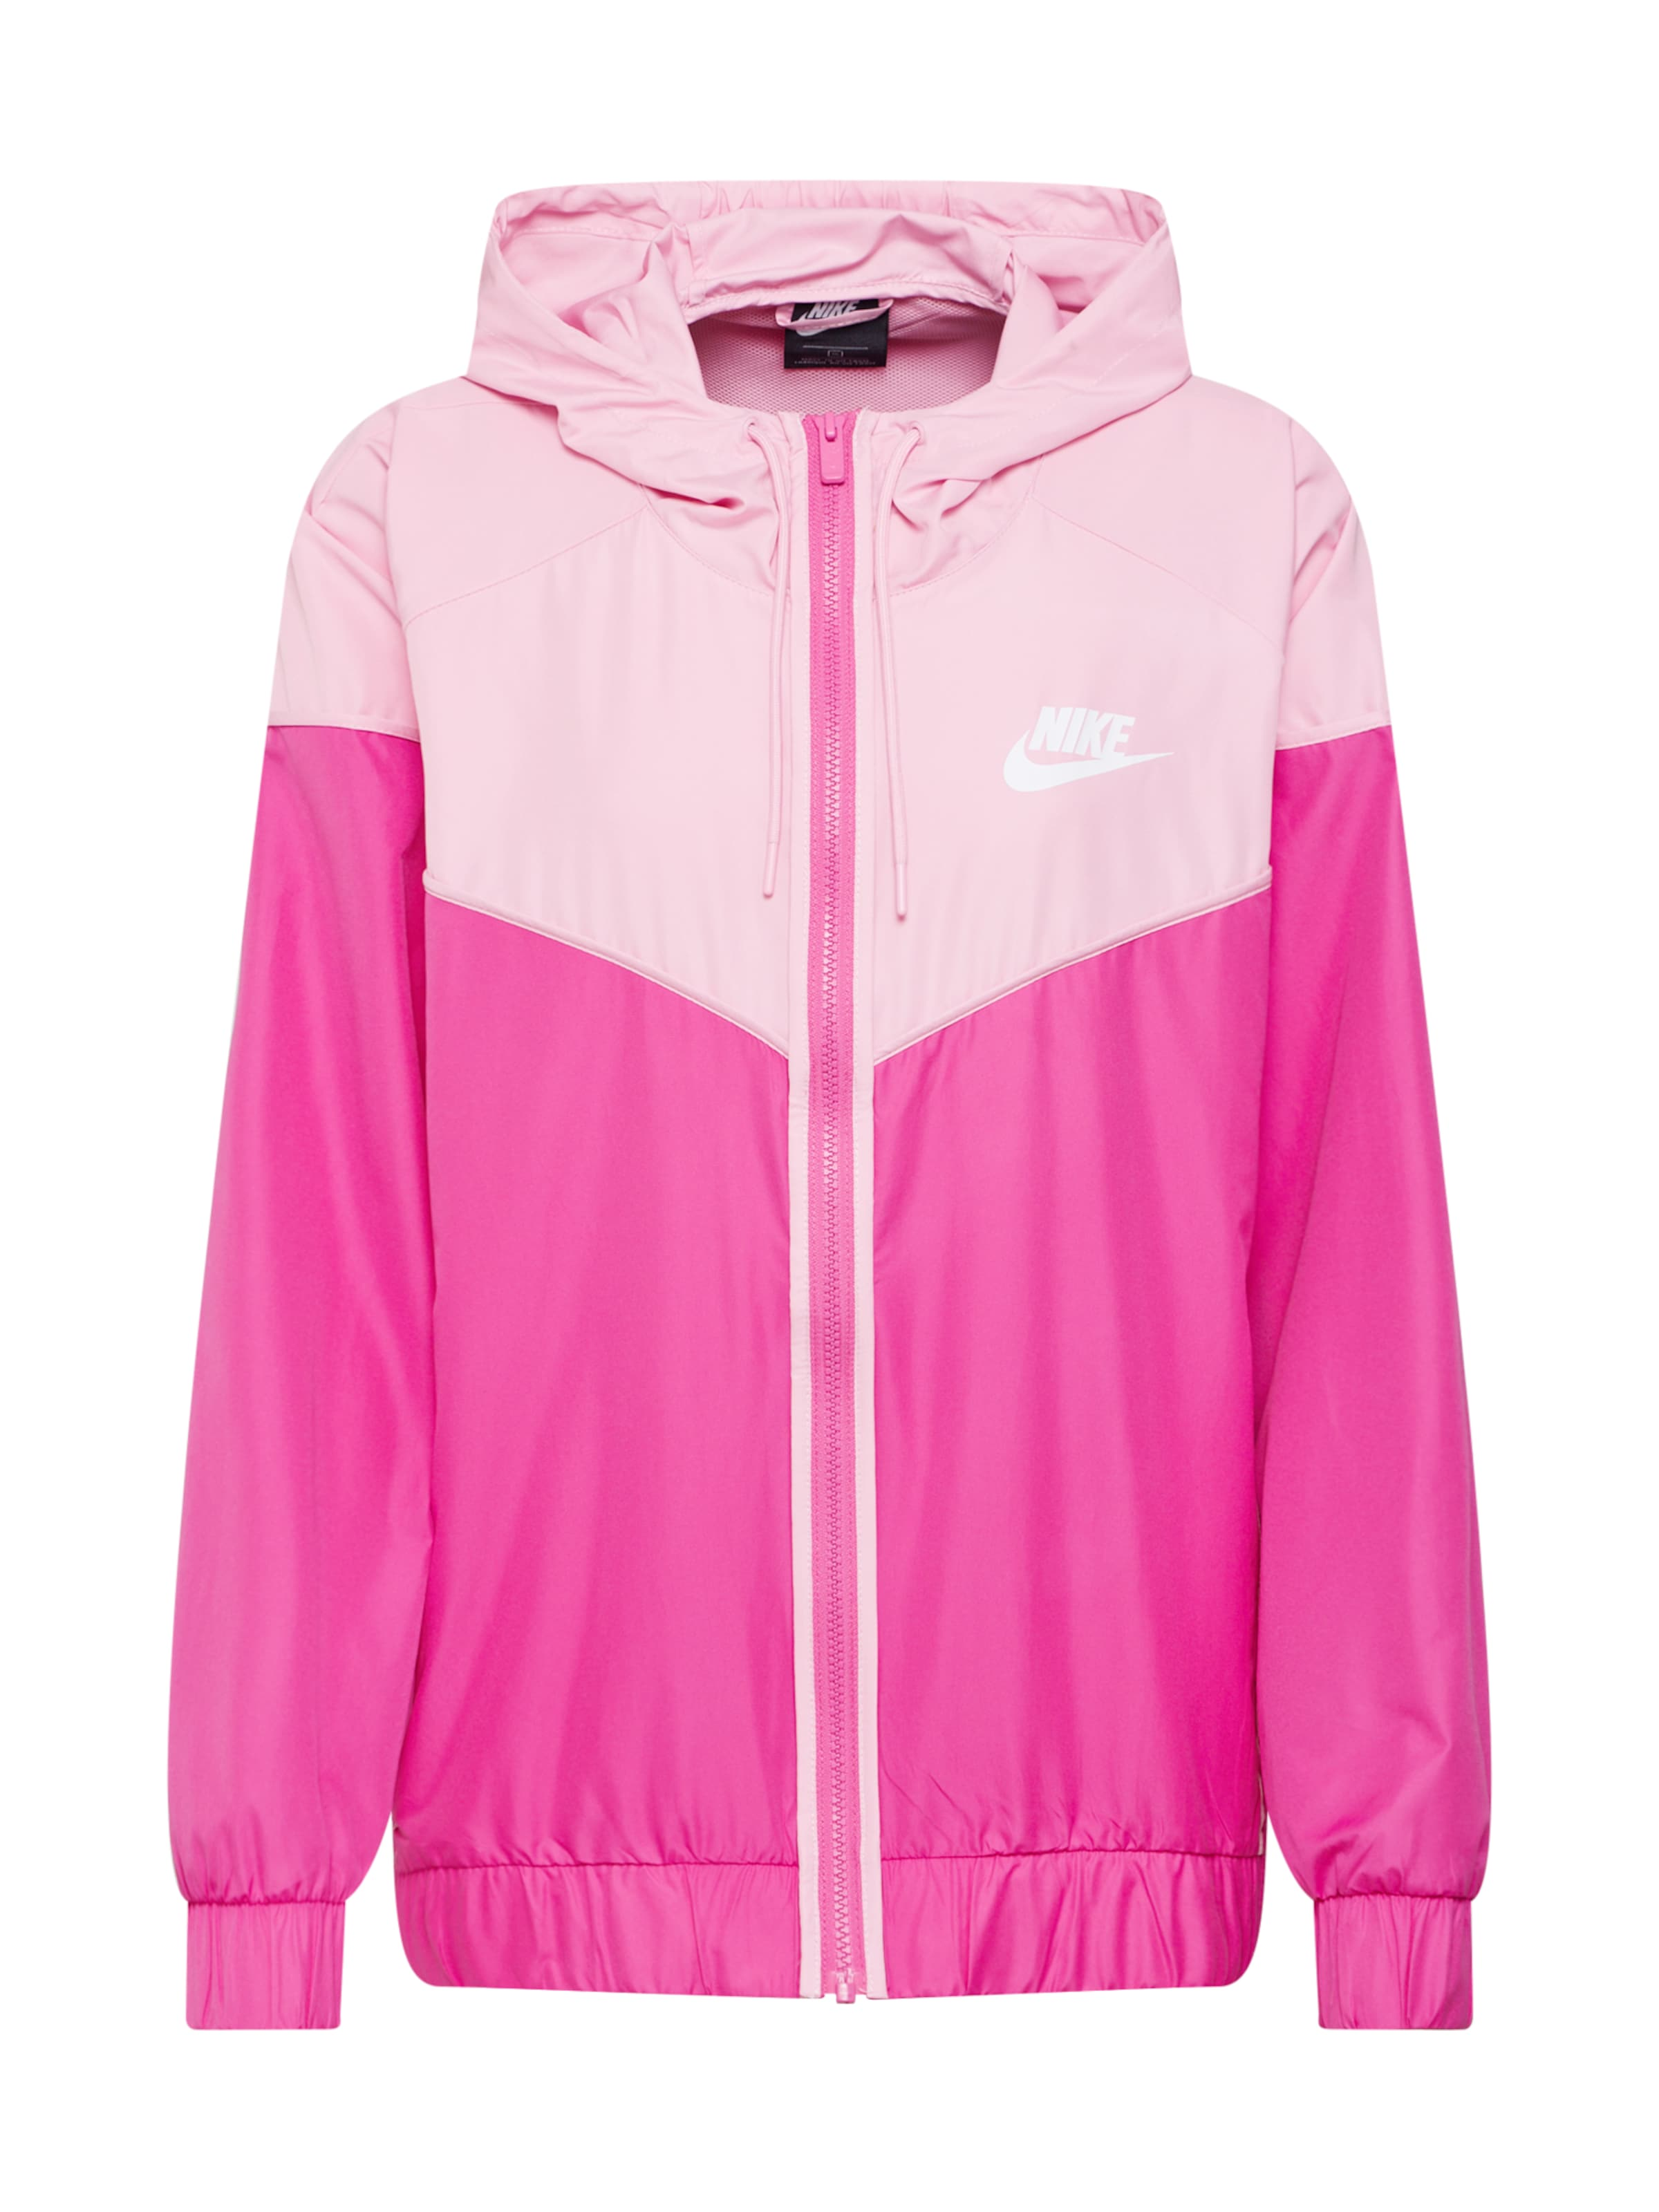 Sportswear saison En Nike Veste Rose Mi v0ywPmNOn8